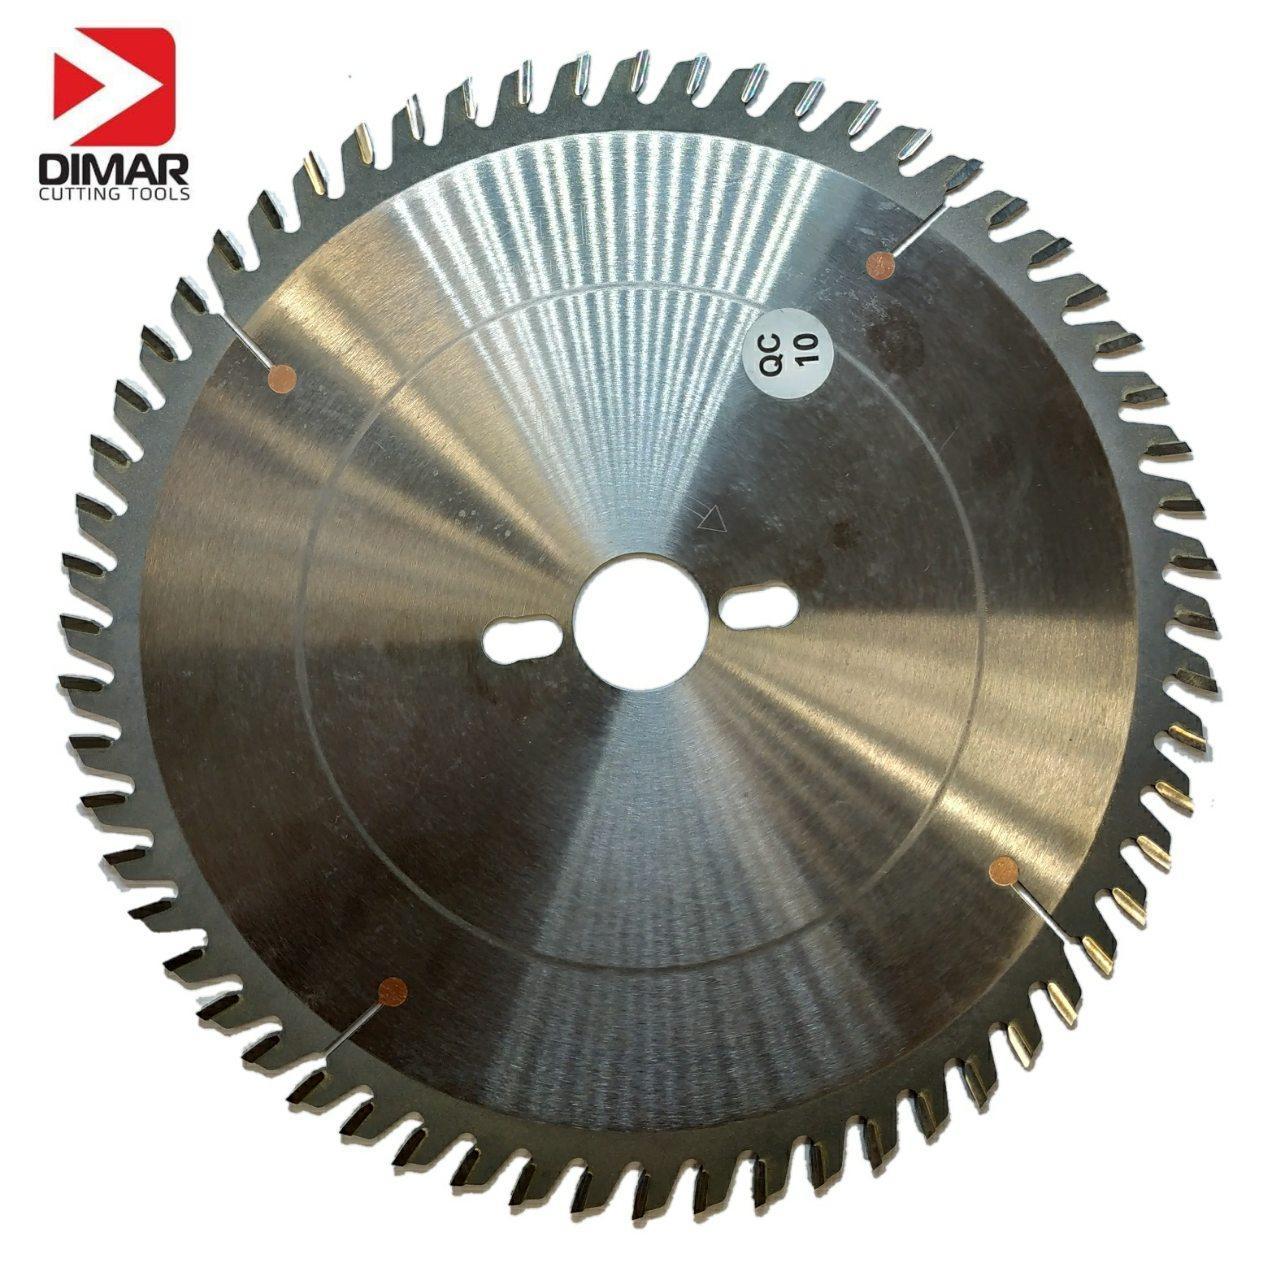 Пила DIMAR MFW 254 60Z 3.2/2.2 d=30